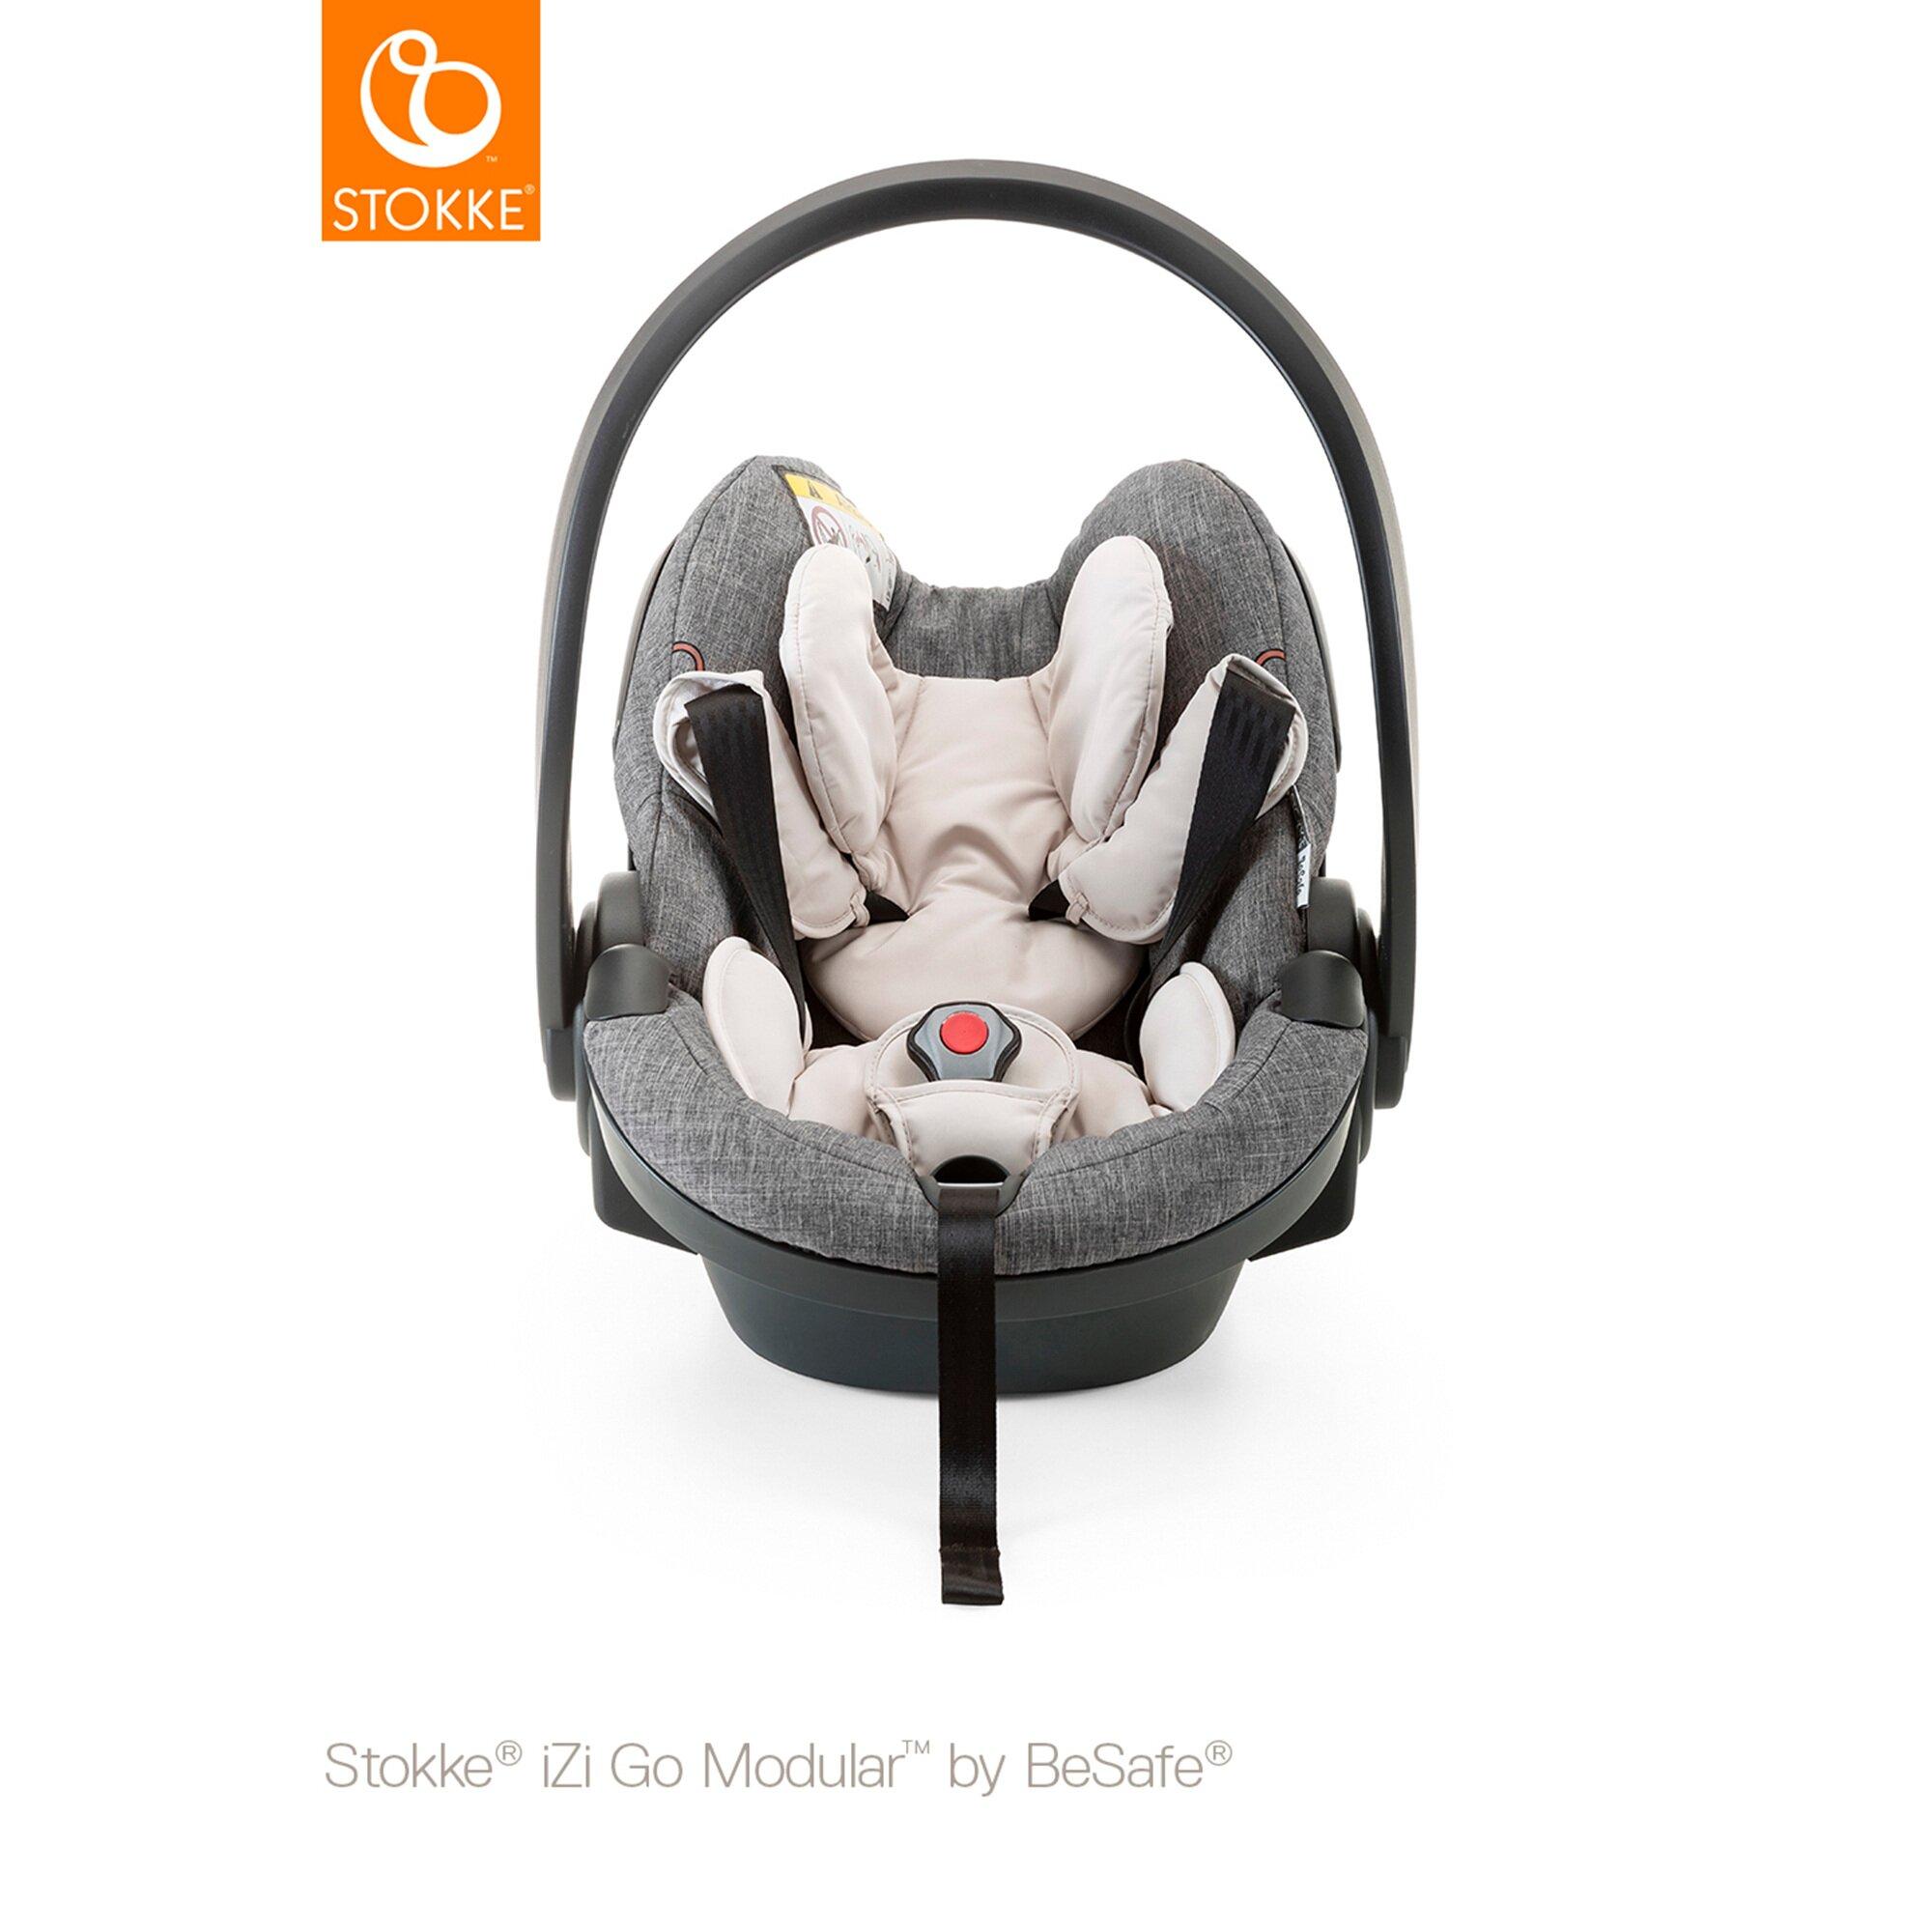 izi-go-izi-go-modular-by-besafe-babyschale-schwarz, 297.99 EUR @ babywalz-de